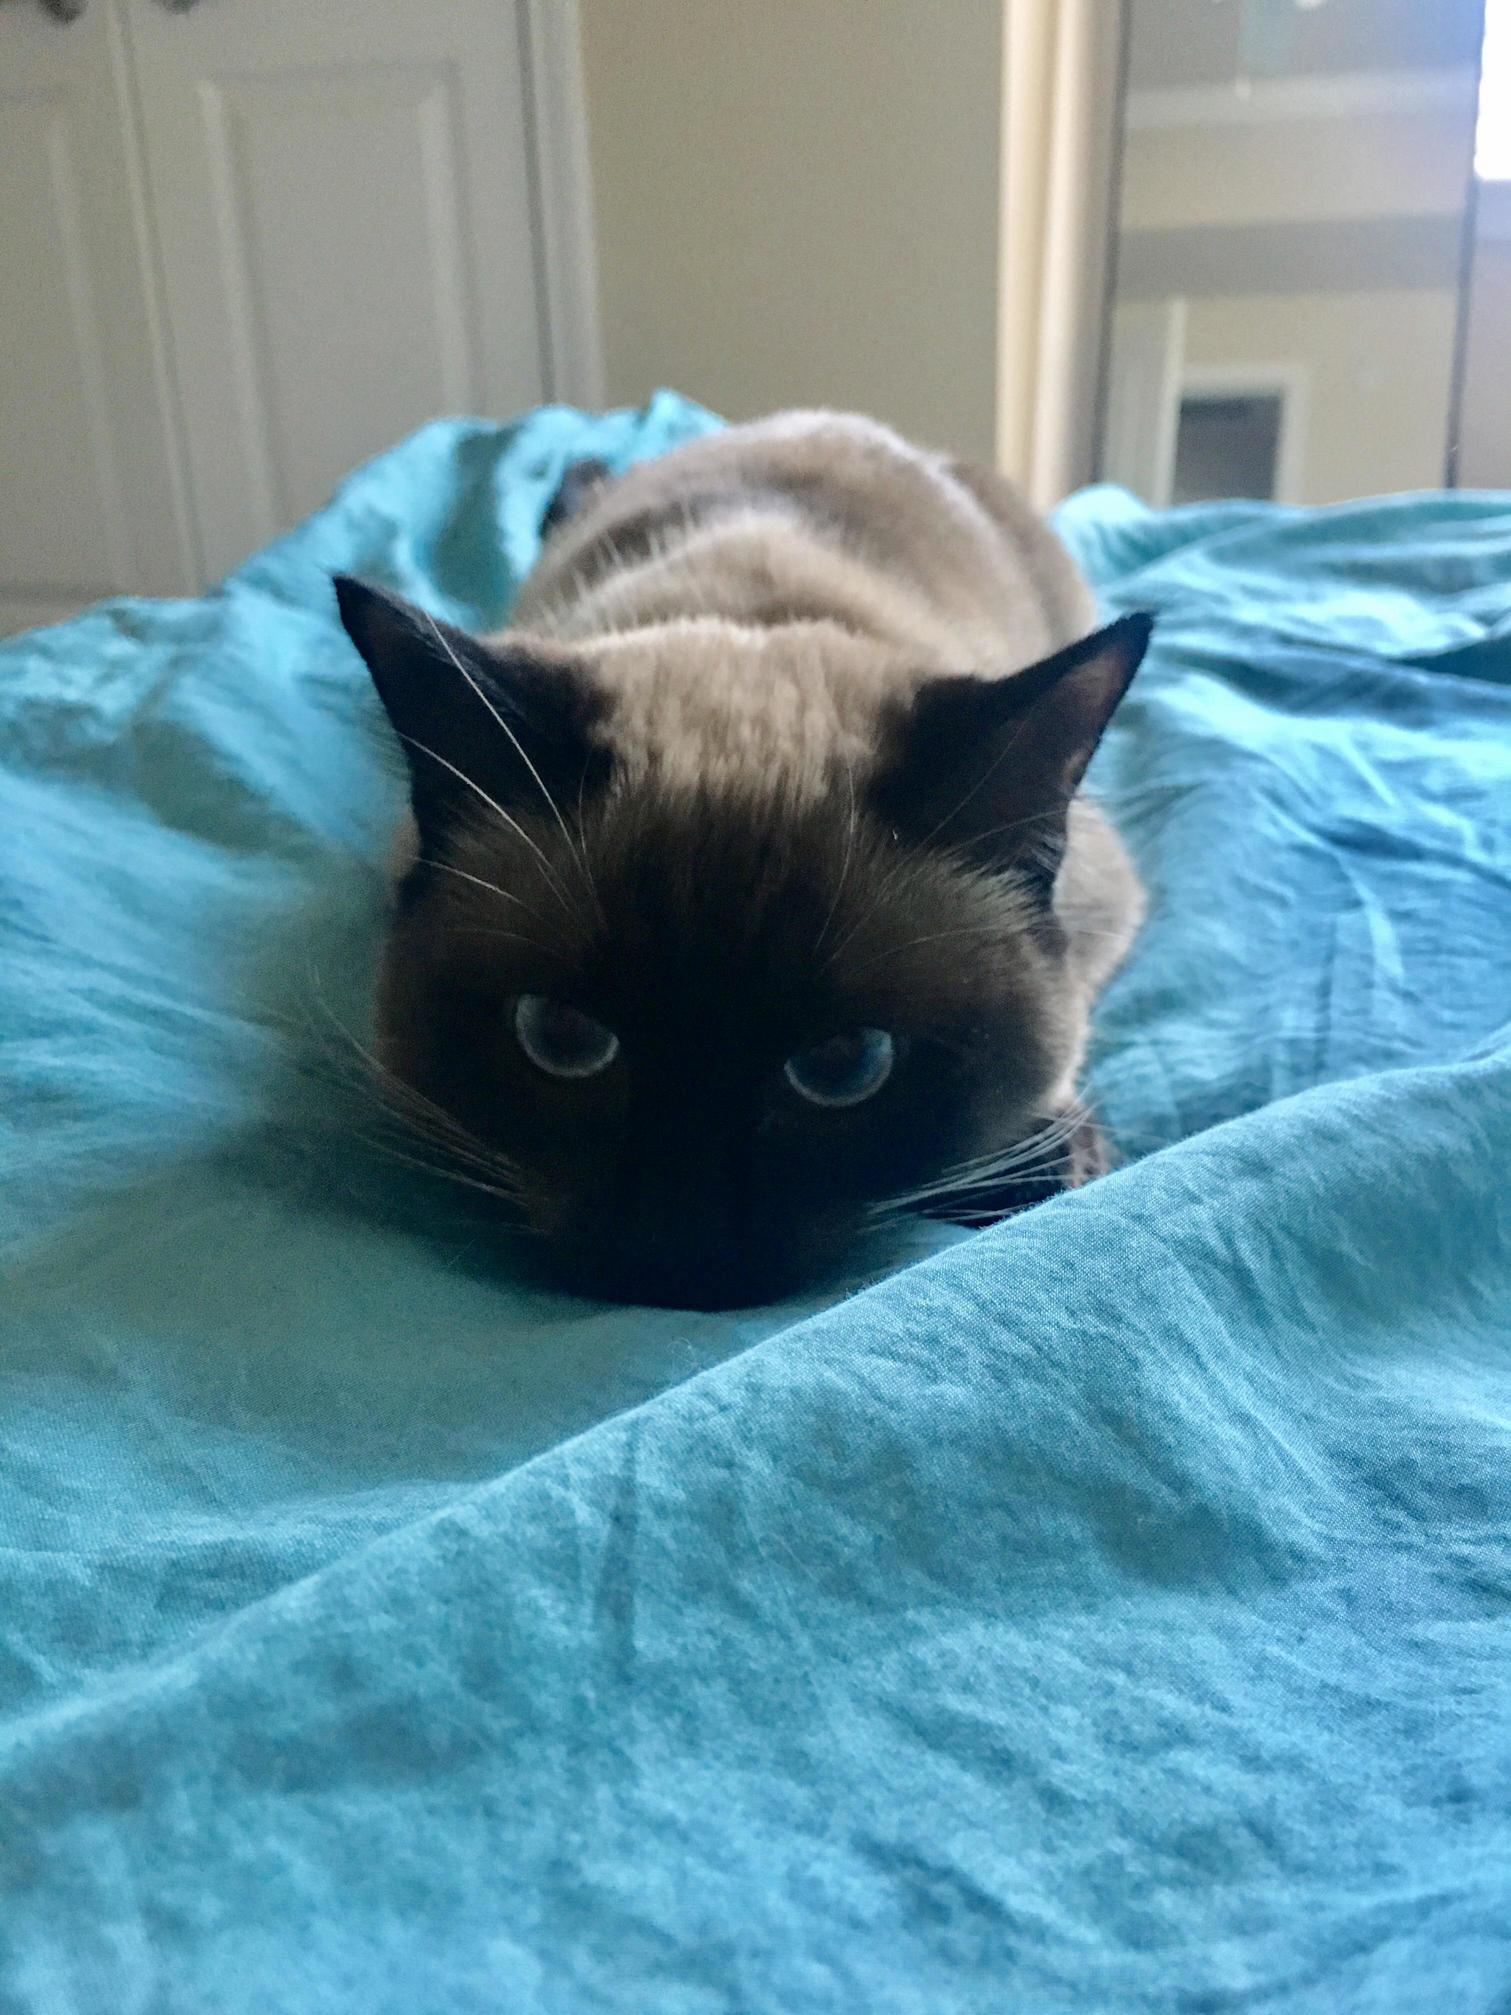 Bettr watch out u… i am cat